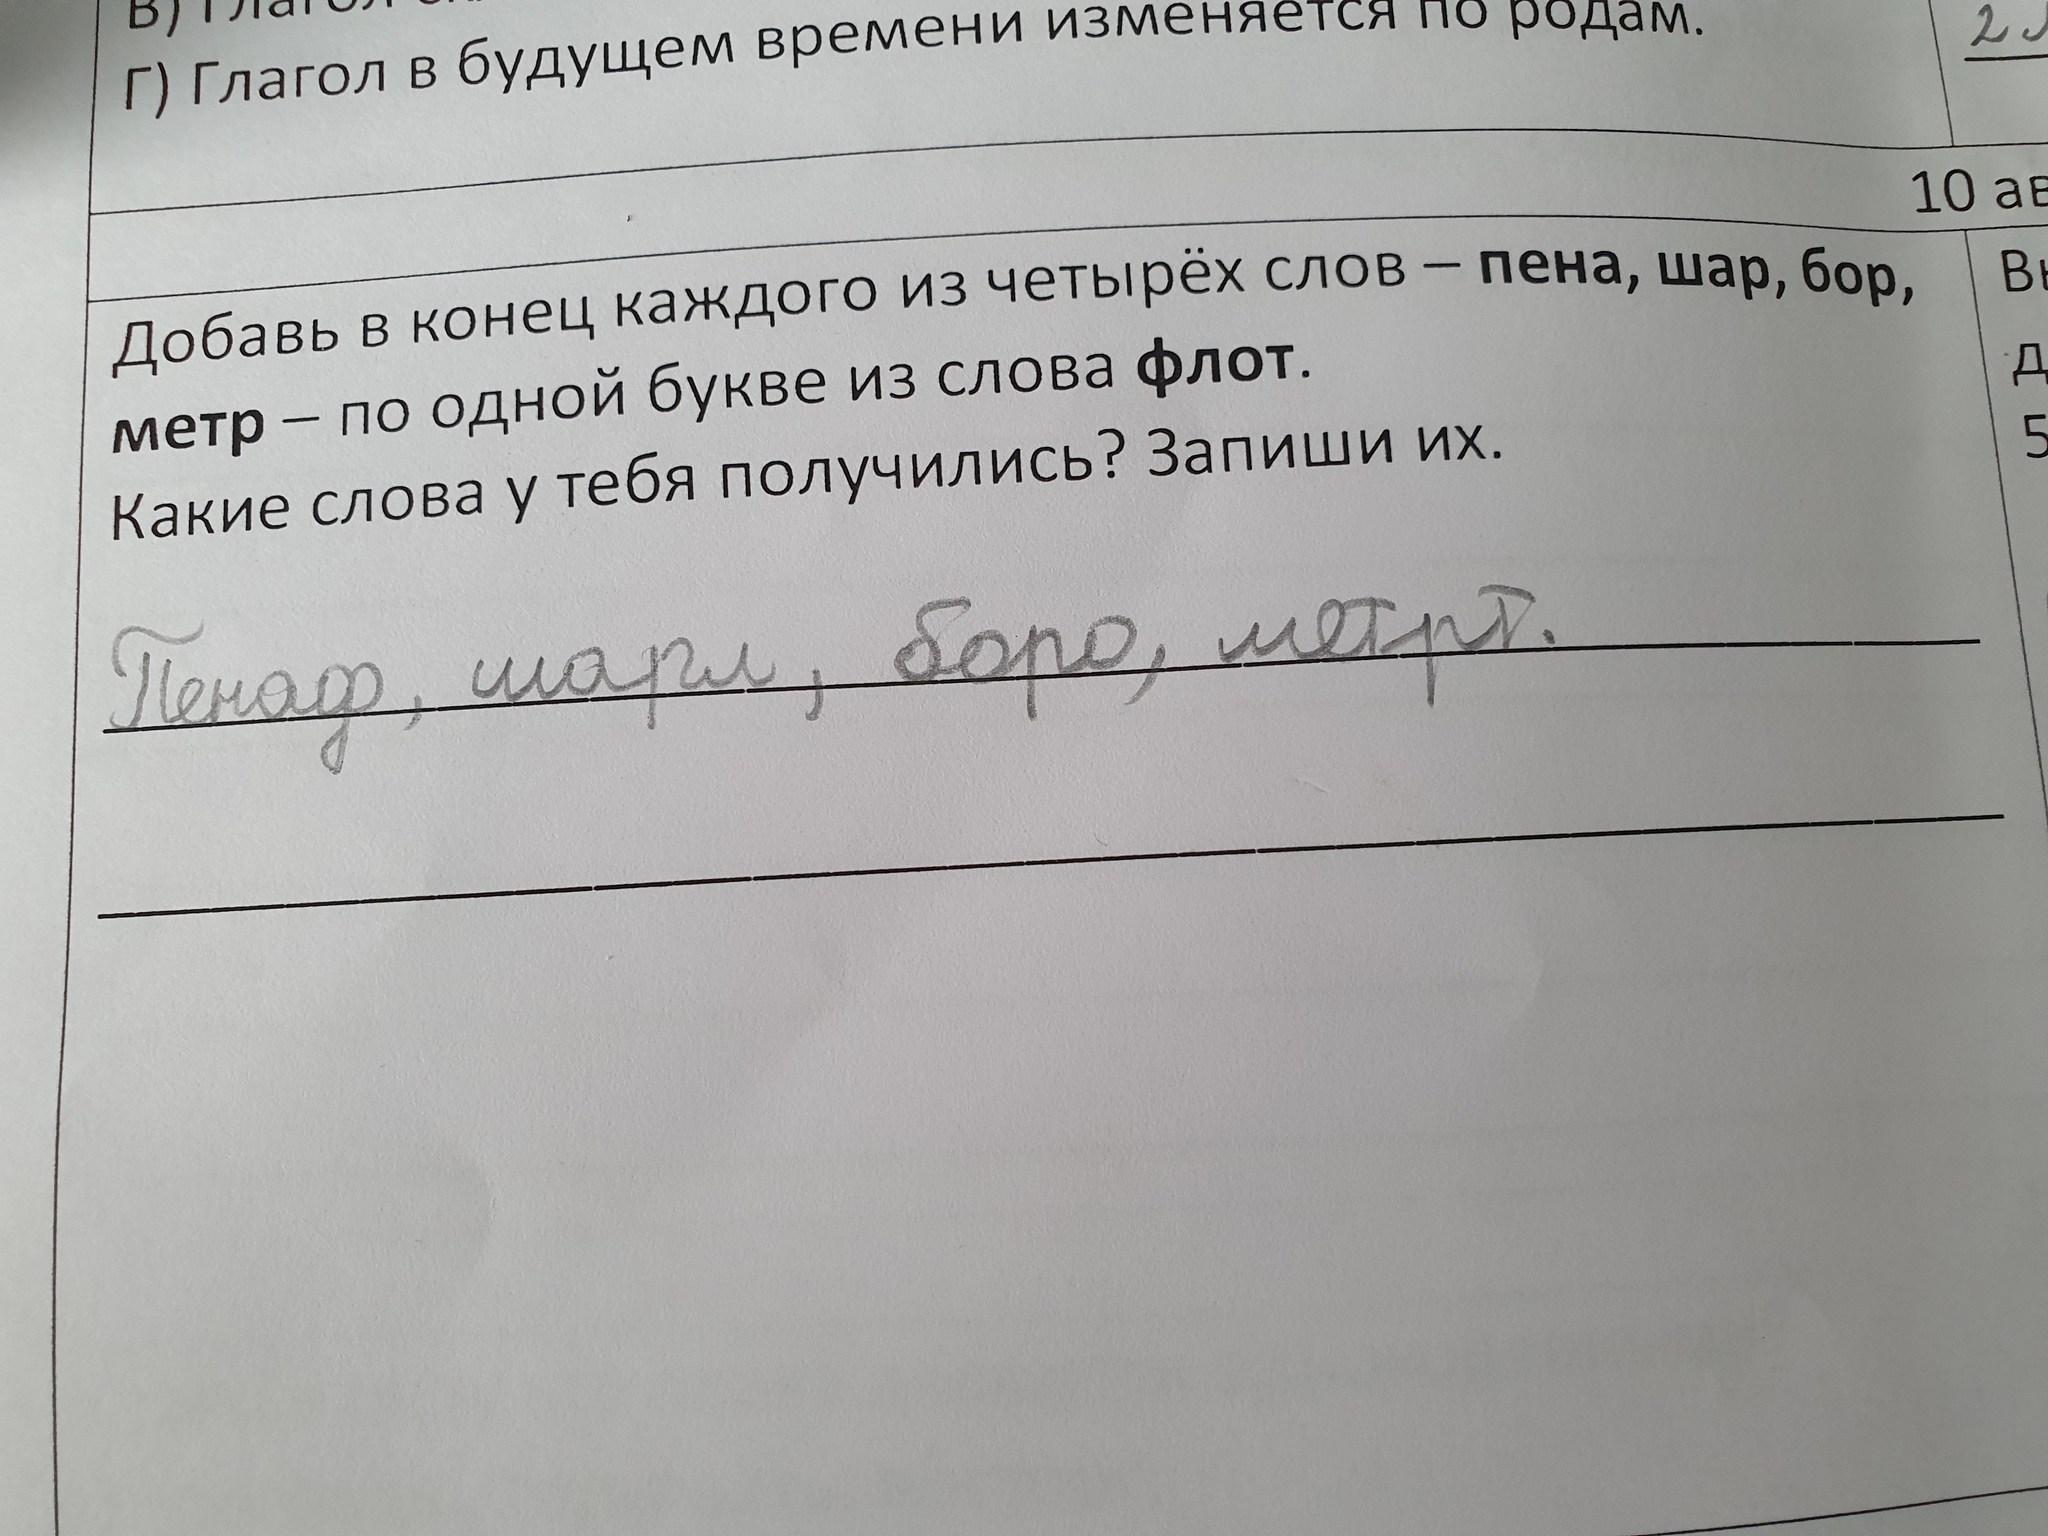 https://cs10.pikabu.ru/post_img/big/2020/08/15/6/1597479817151076979.jpg